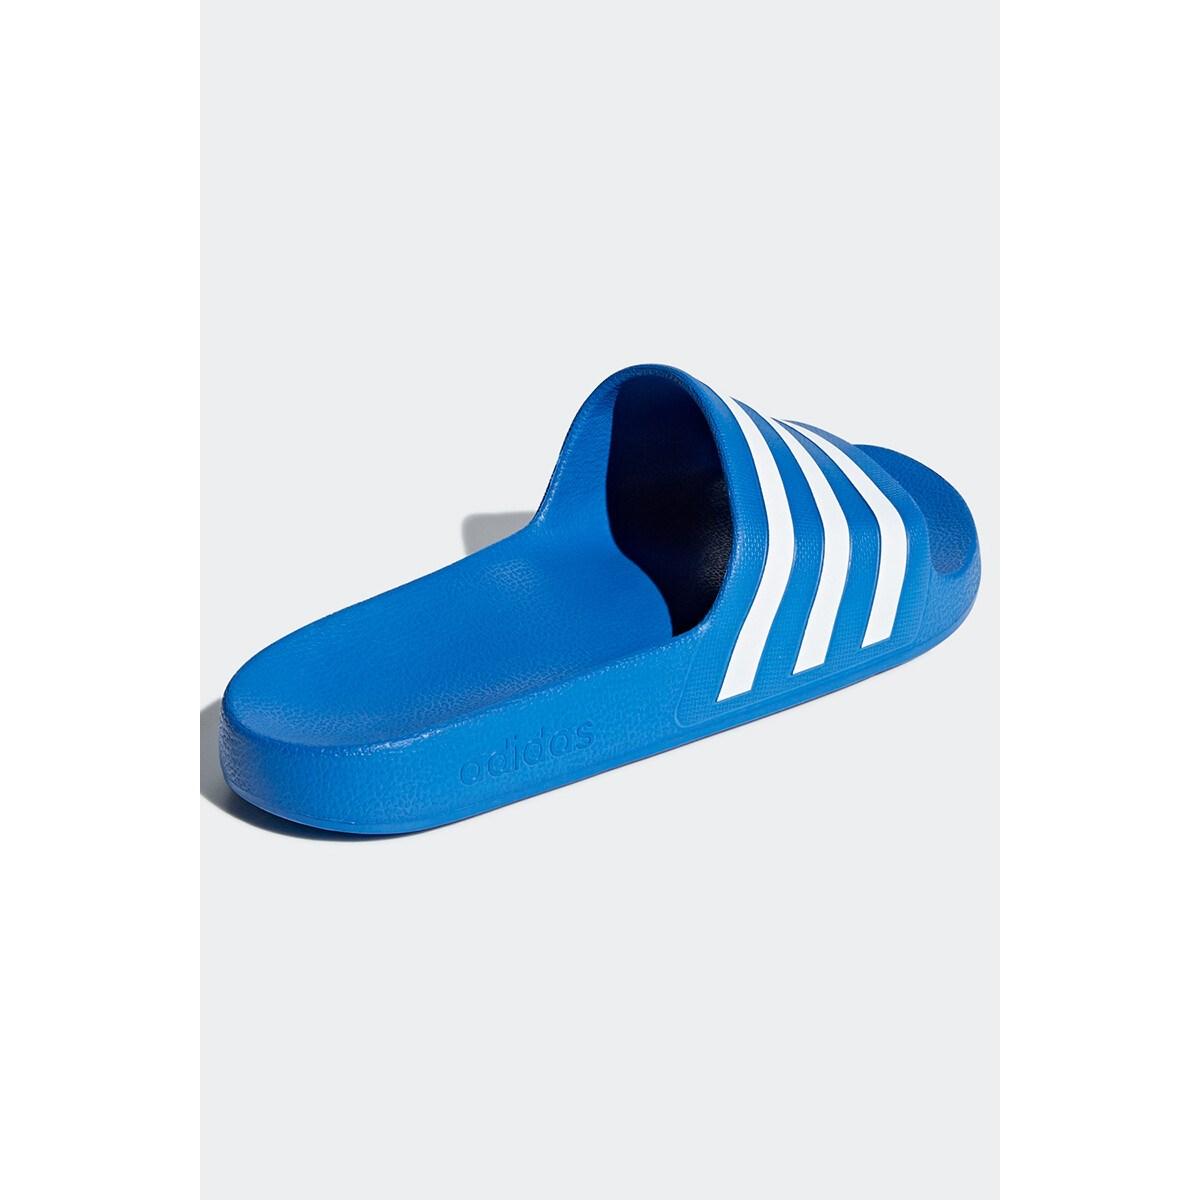 Adilette Aqua Deniz Mavisi Unisex Spor Terlik